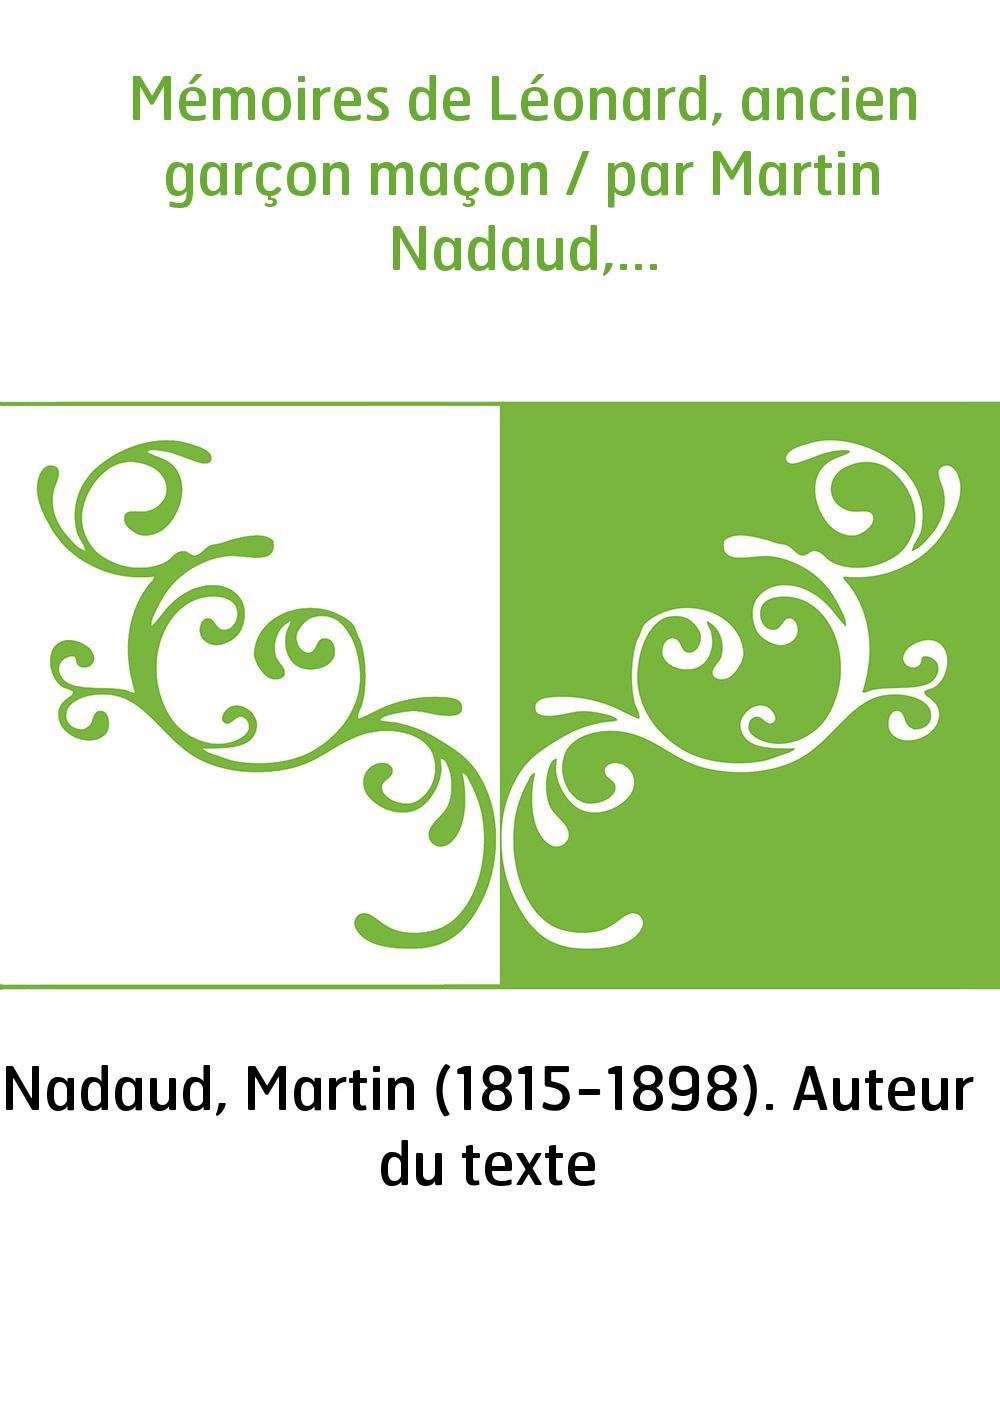 Mémoires de Léonard, ancien garçon maçon / par Martin Nadaud,...